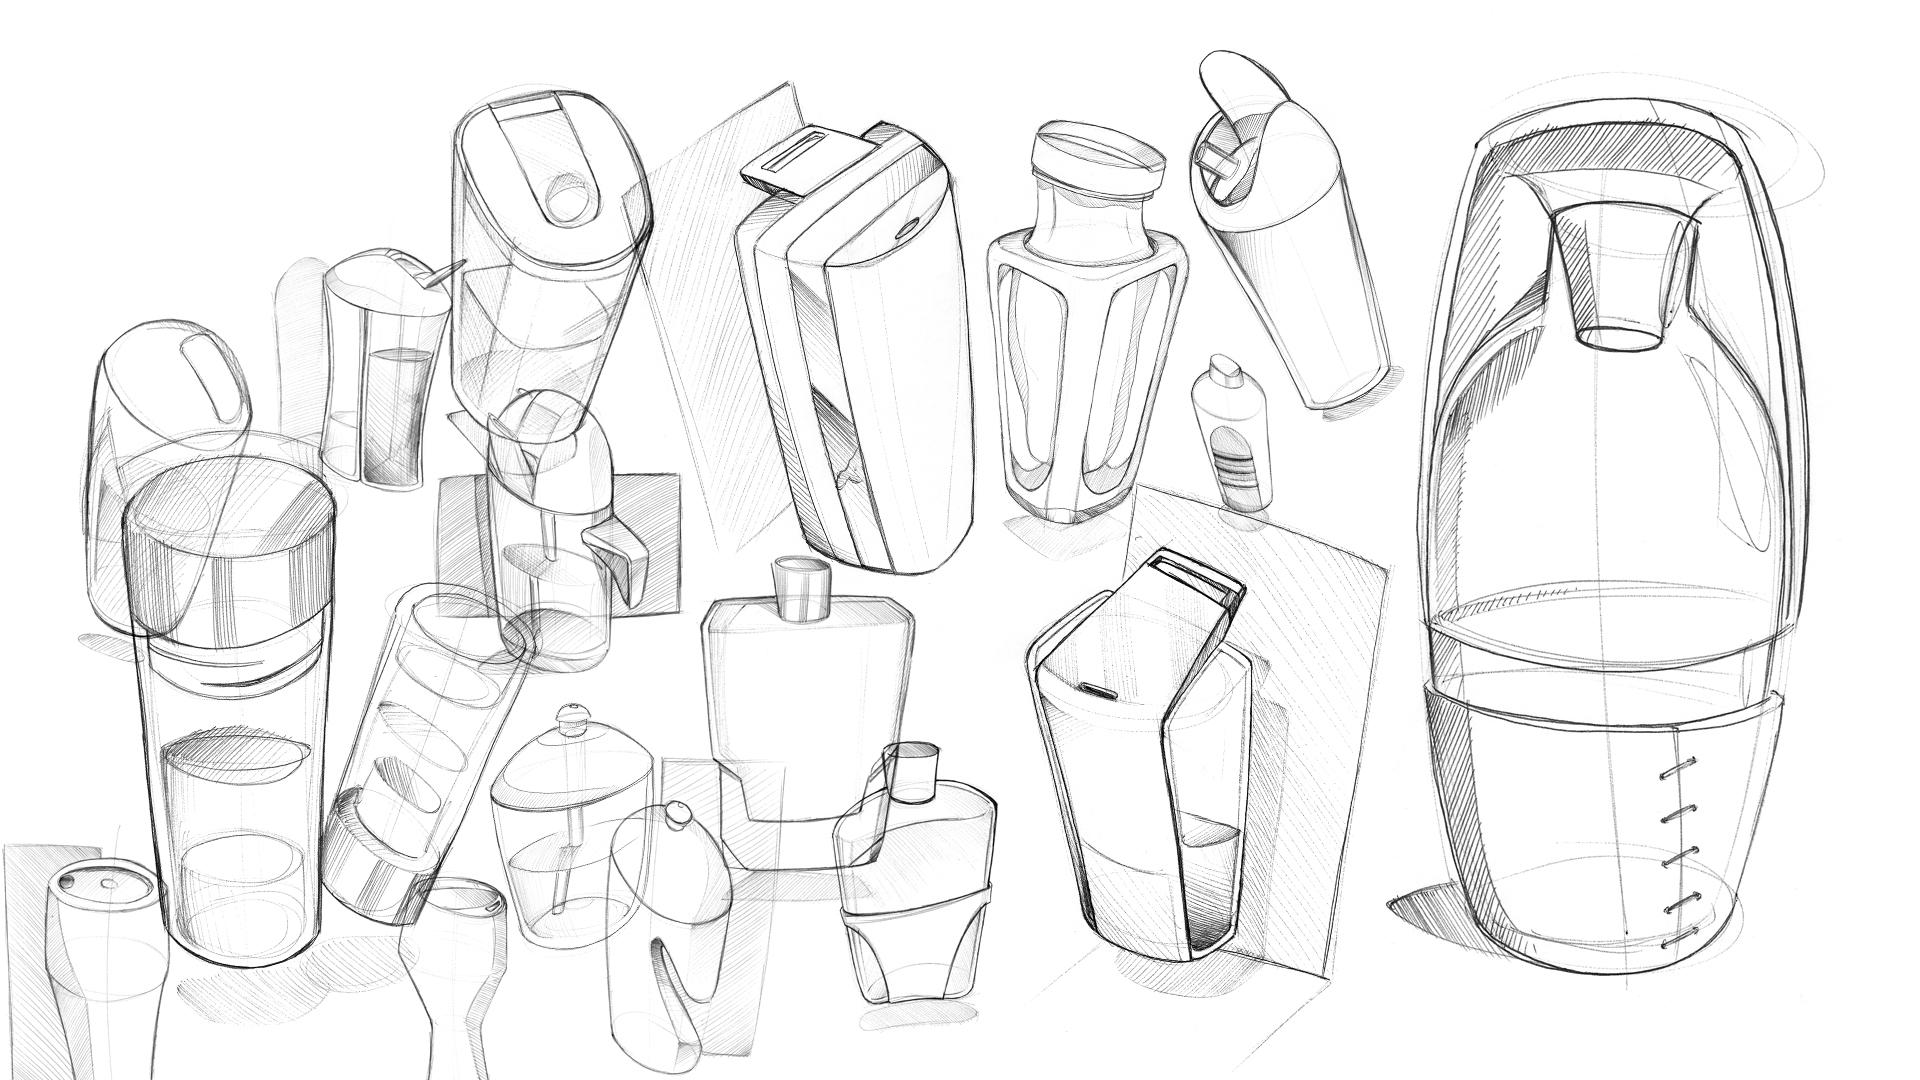 bottle_sketches.jpg